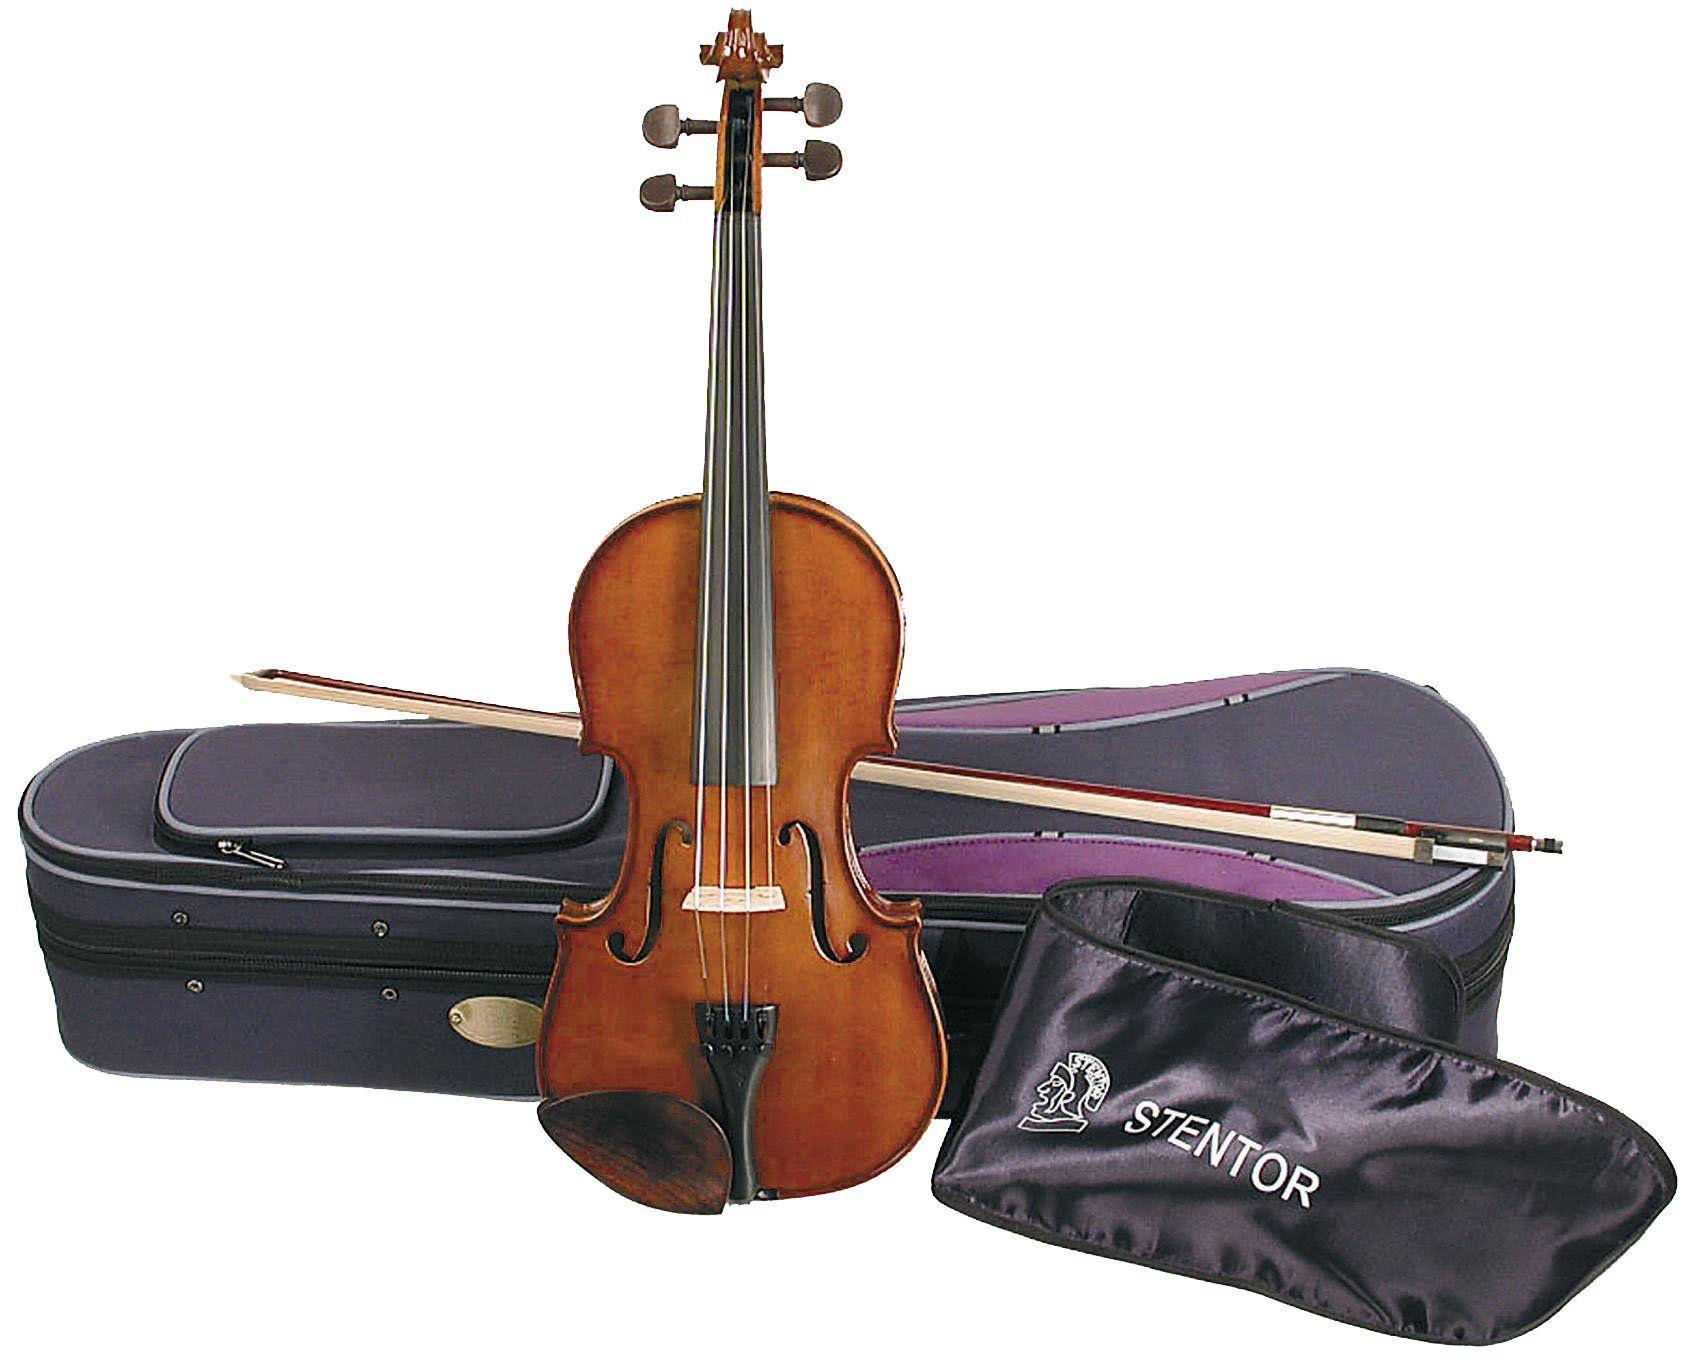 Violins, Violas, Bows, Strings and Accessories Benning